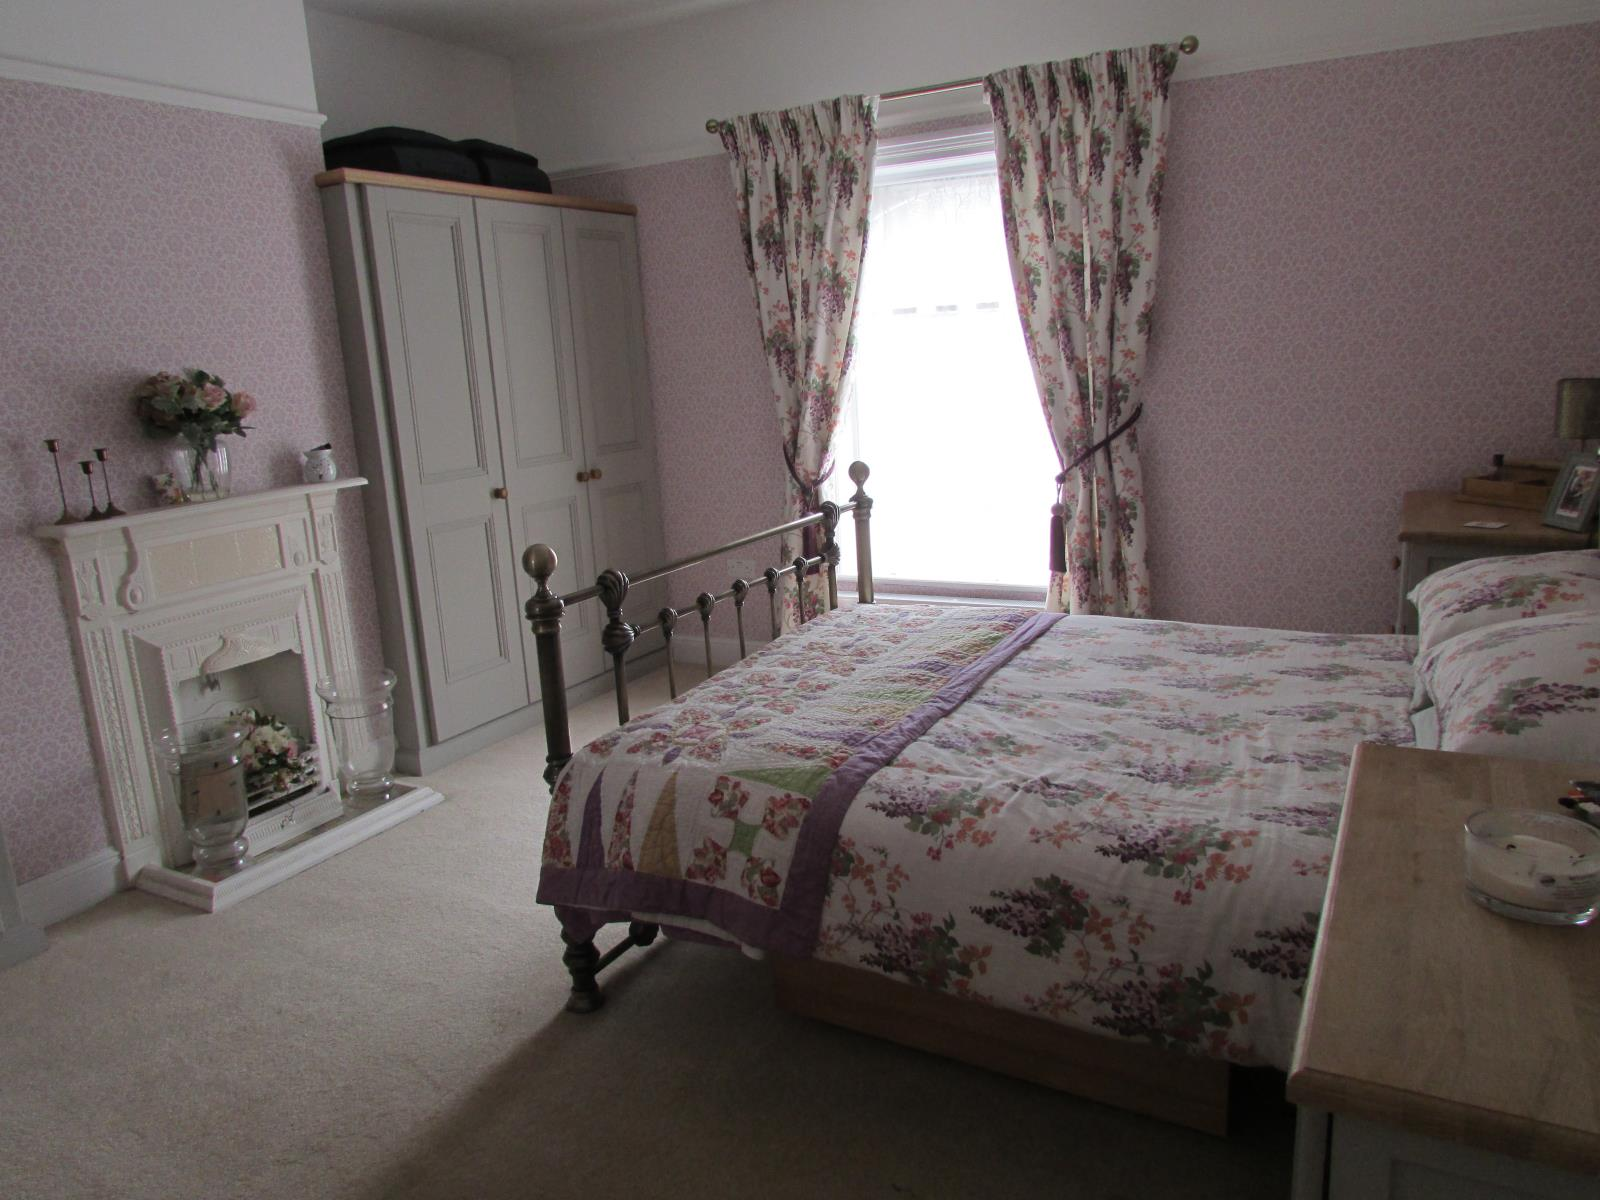 26 Wormald Street Almondbury, Huddersfield, West Yorkshire HD5 8NQ, UK